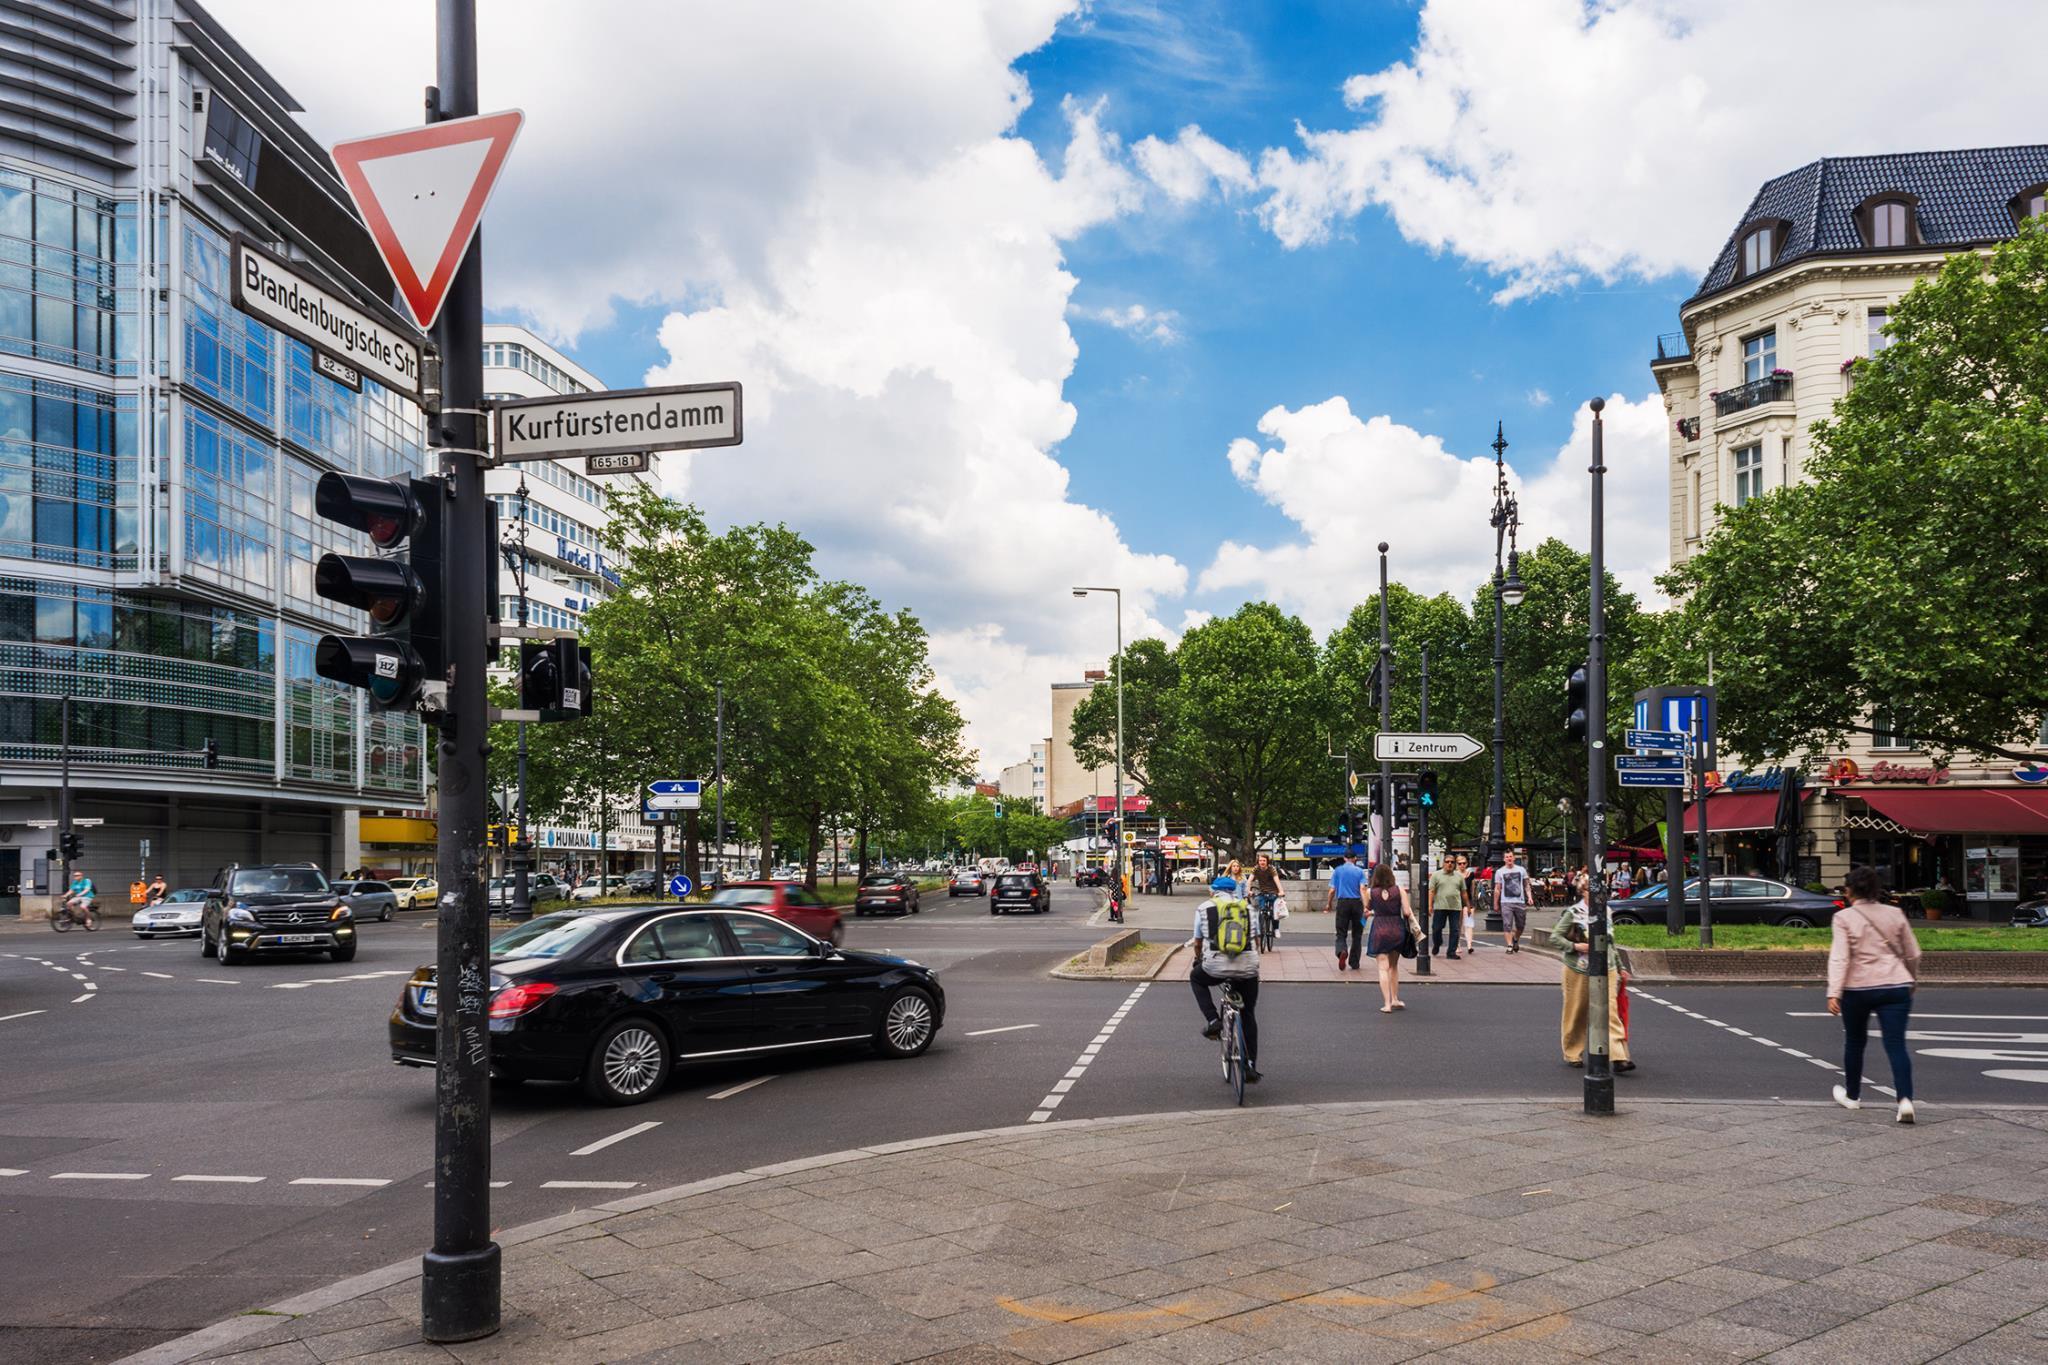 конце картинка улицы берлина редких